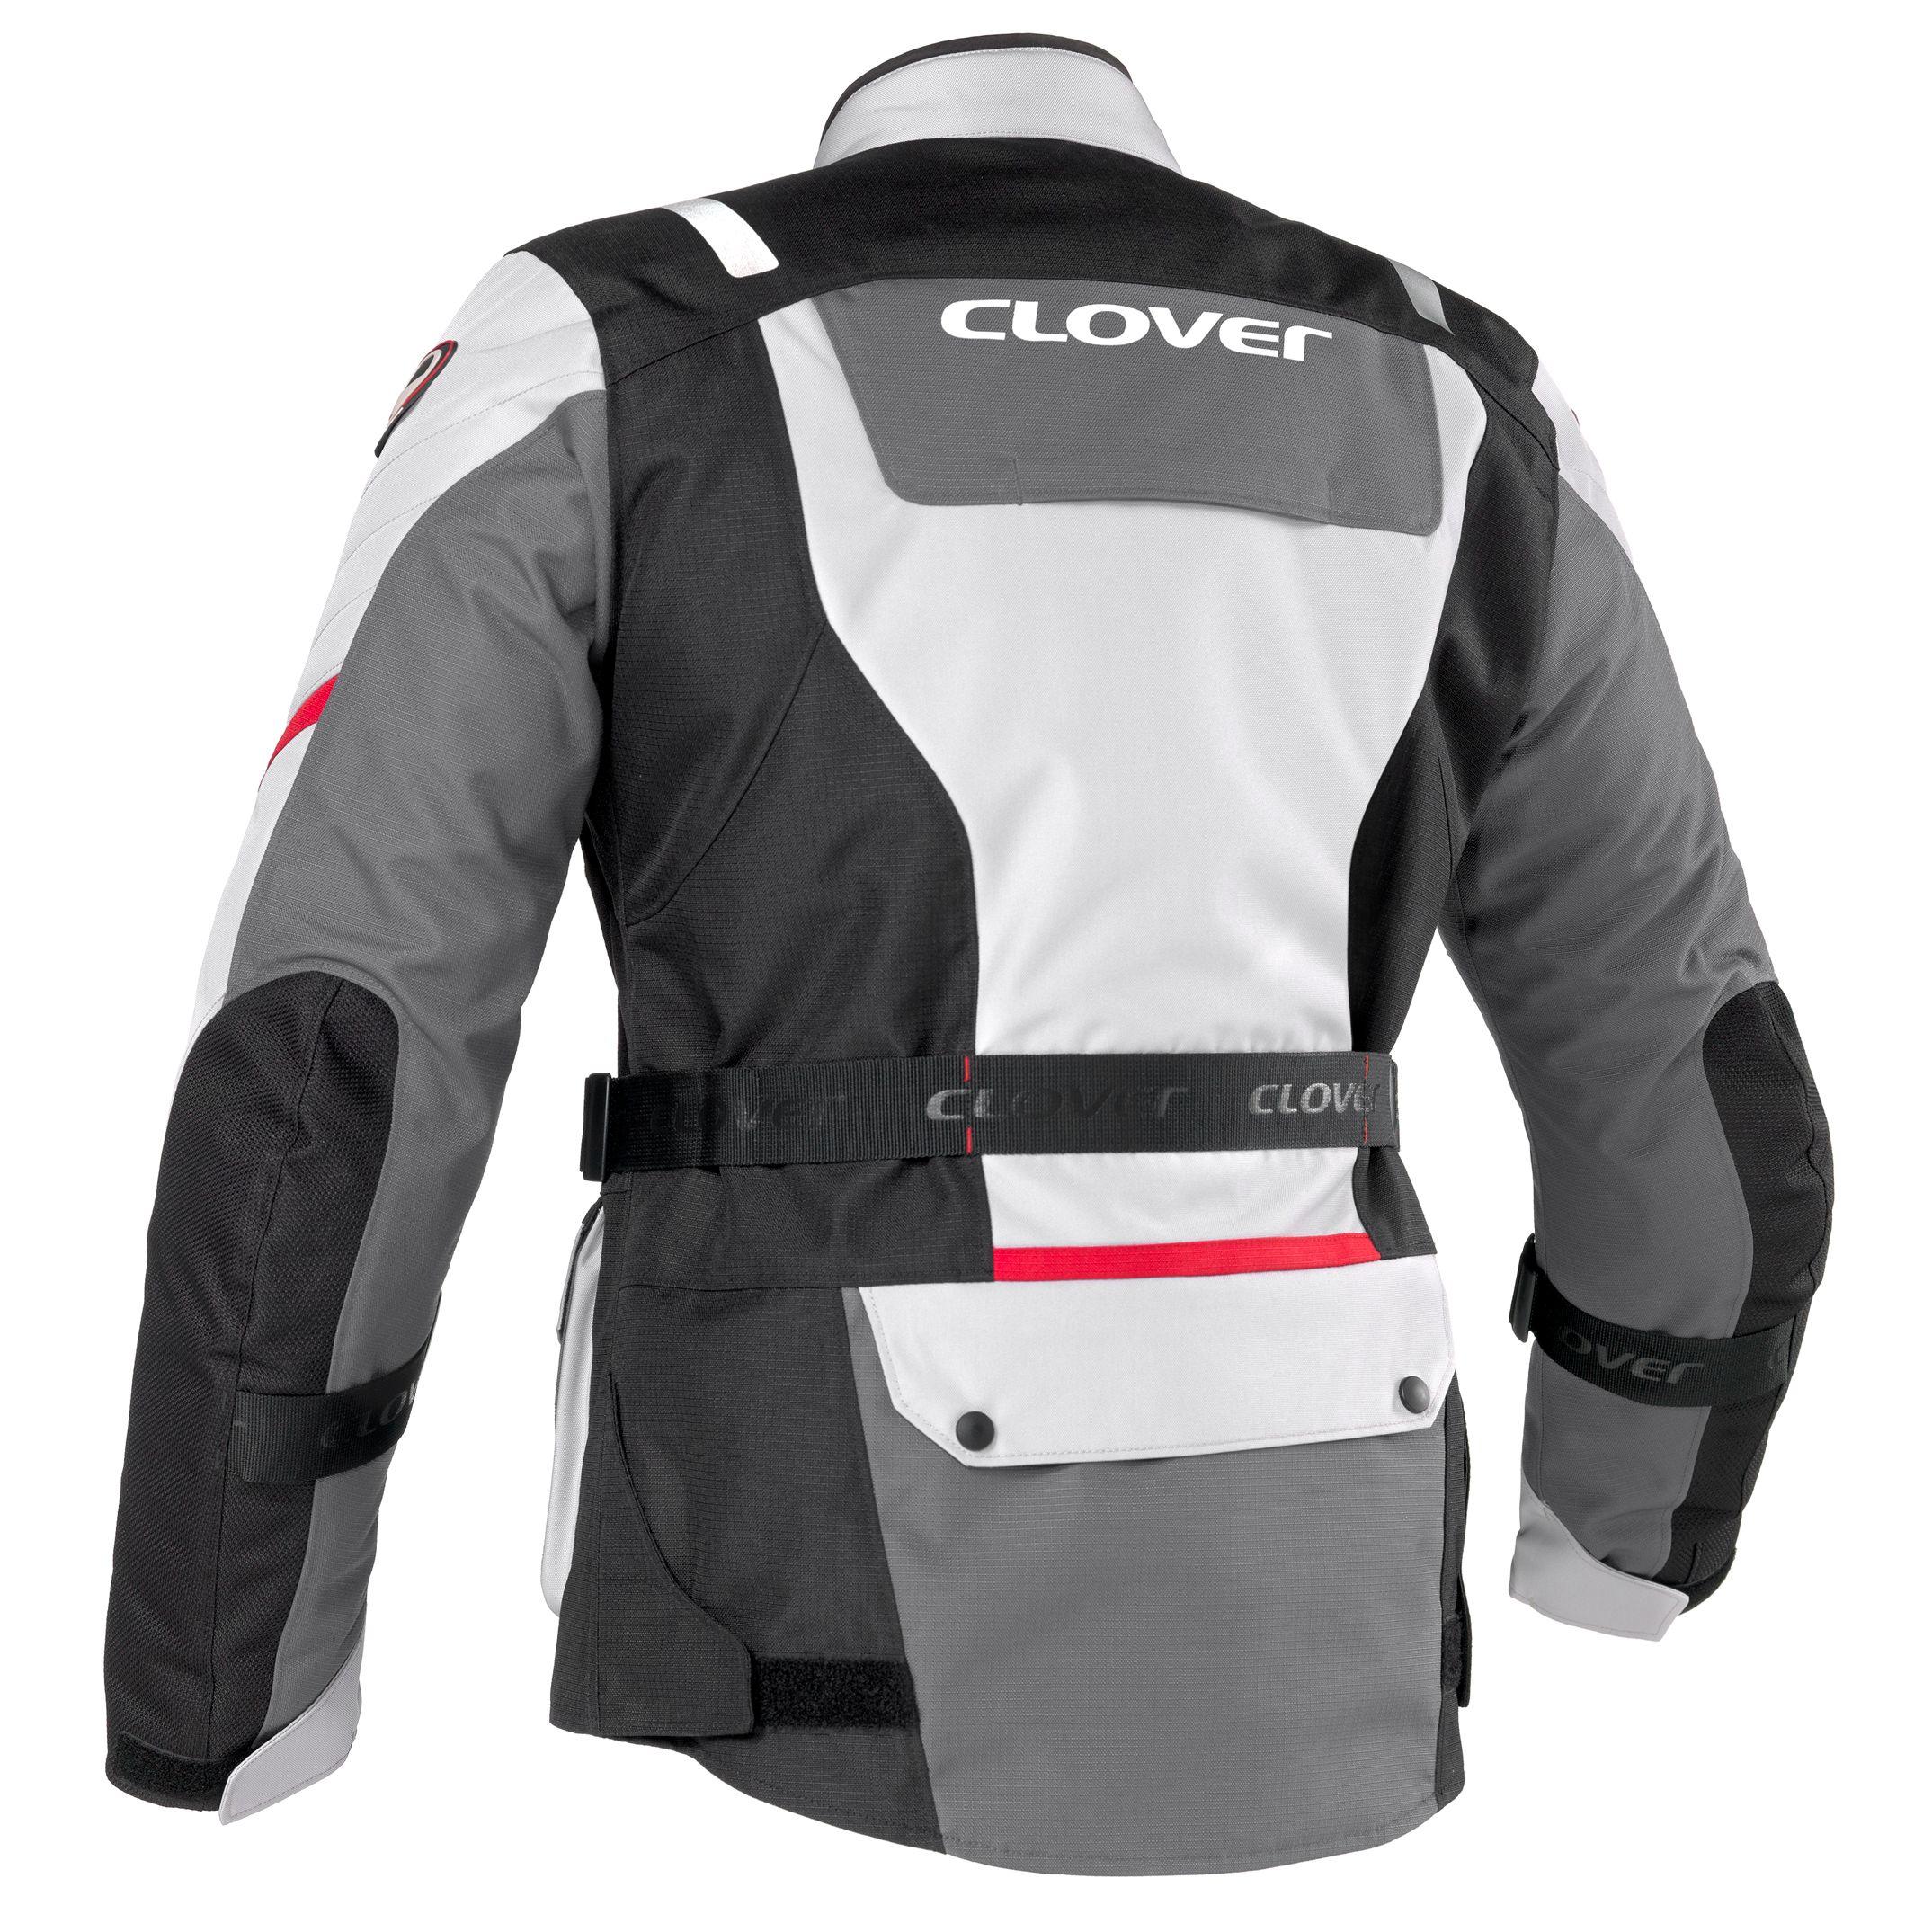 Veste Clover SCOUT-2 WATERPROOF